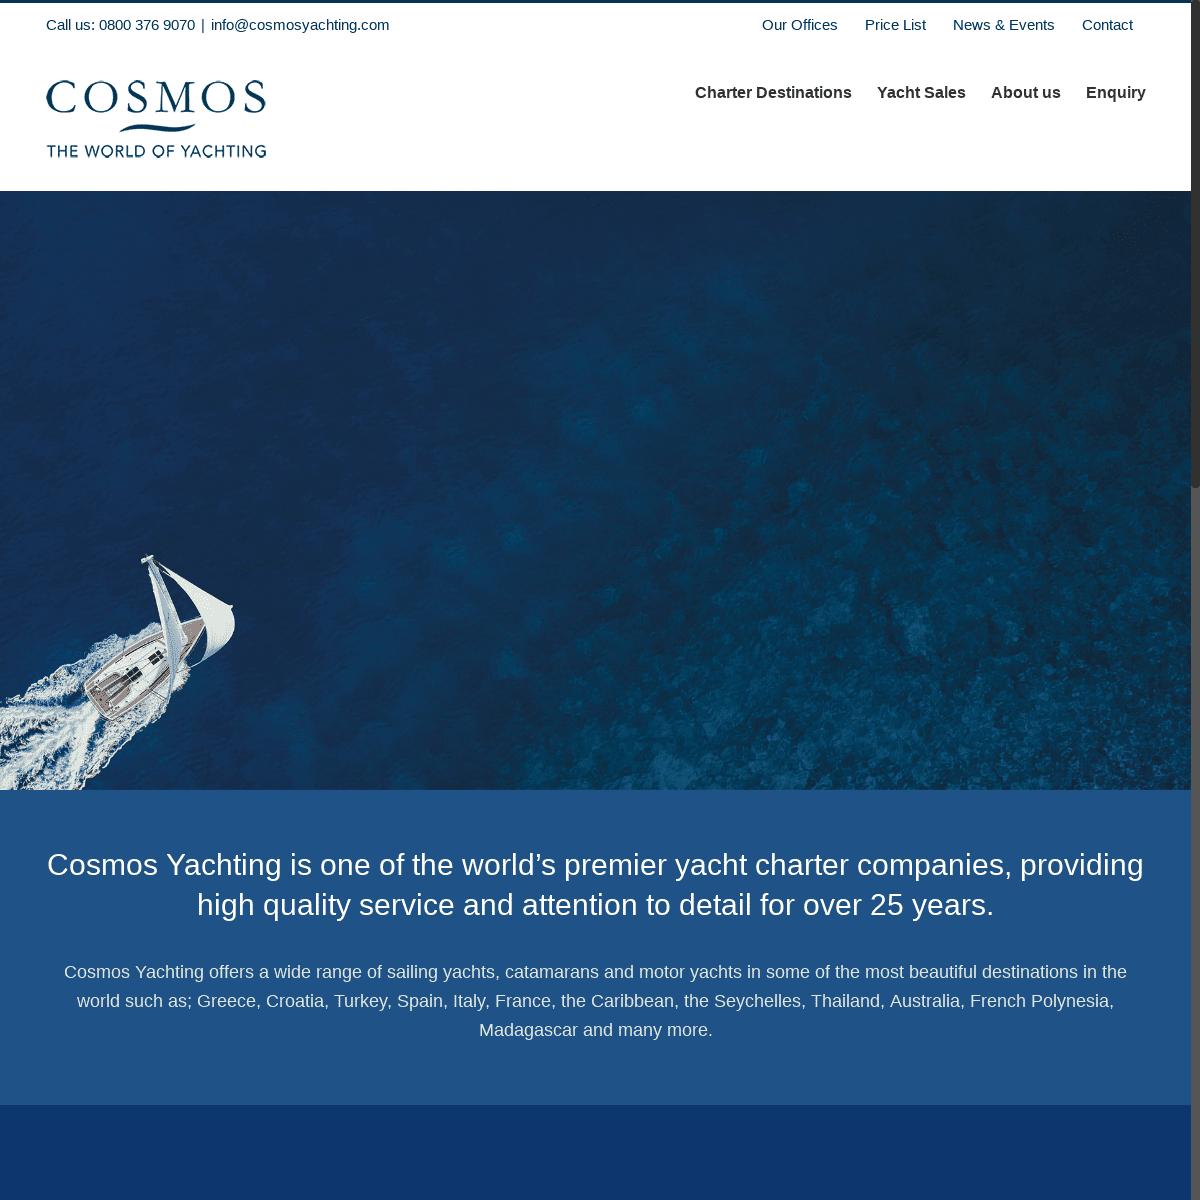 Cosmos Yachting LTD – Charter & Brokerage